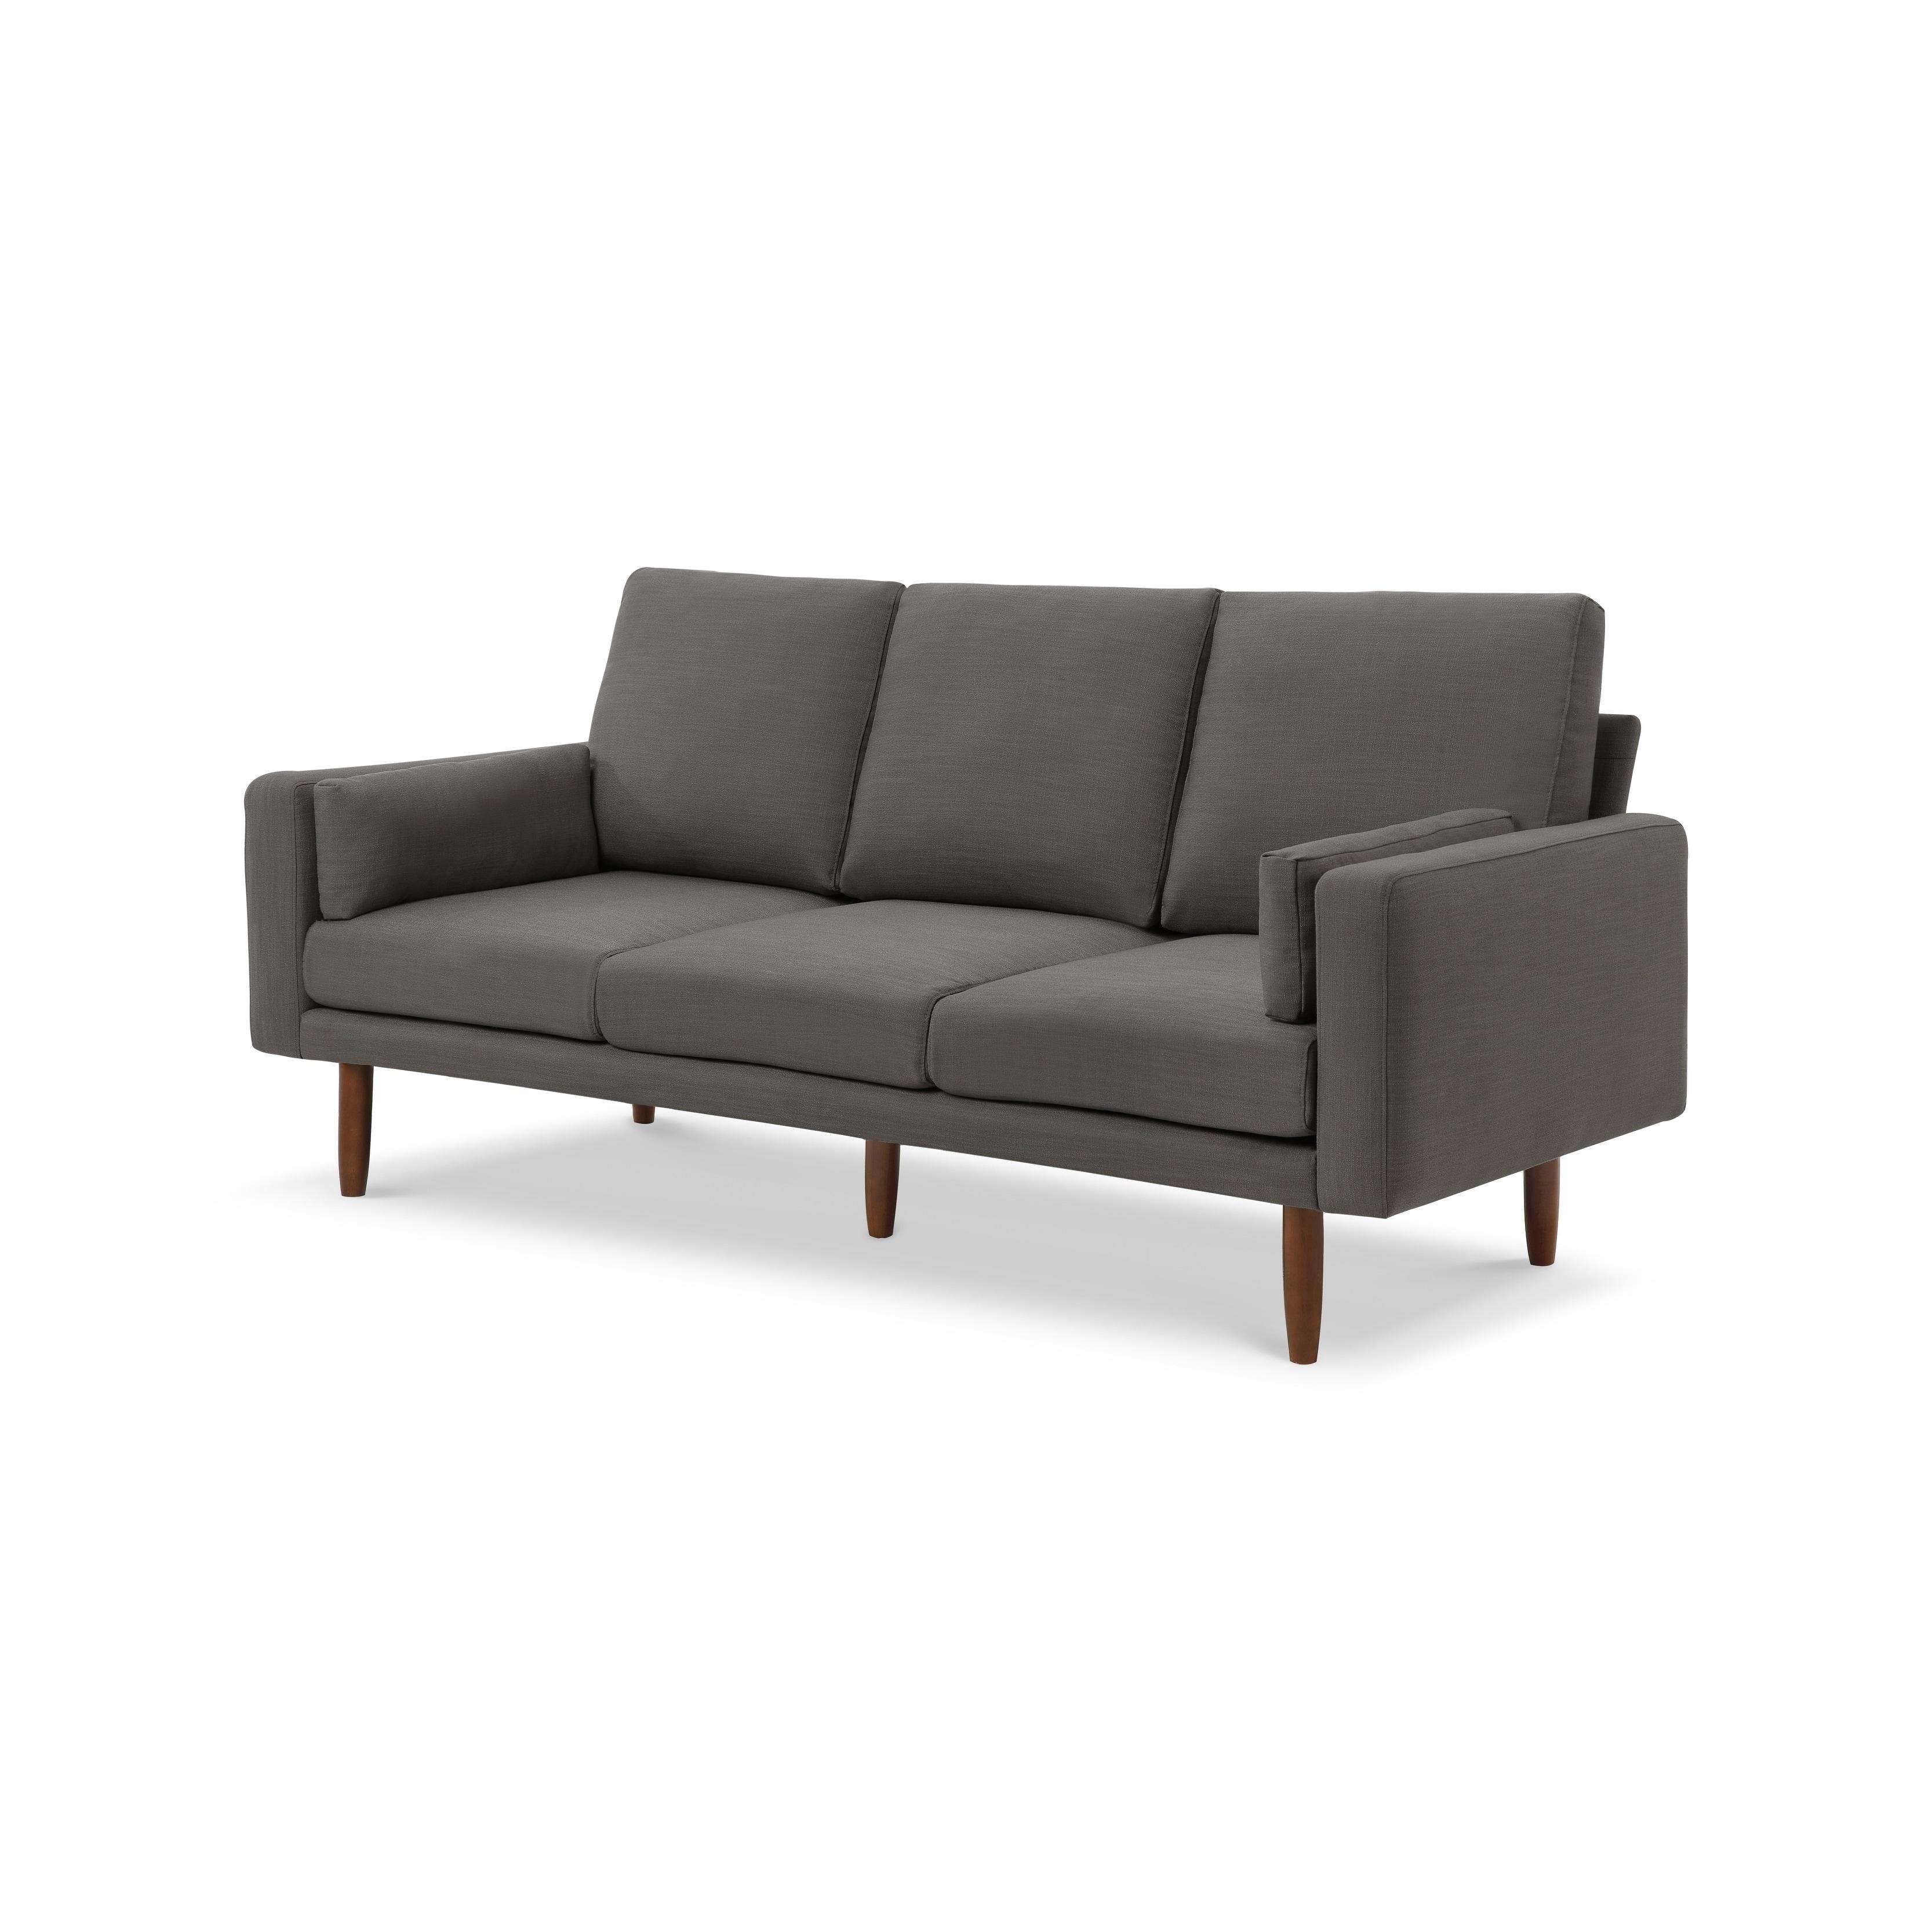 Pasadena Sofa With Usb Ports Free Shipping Today 19751130